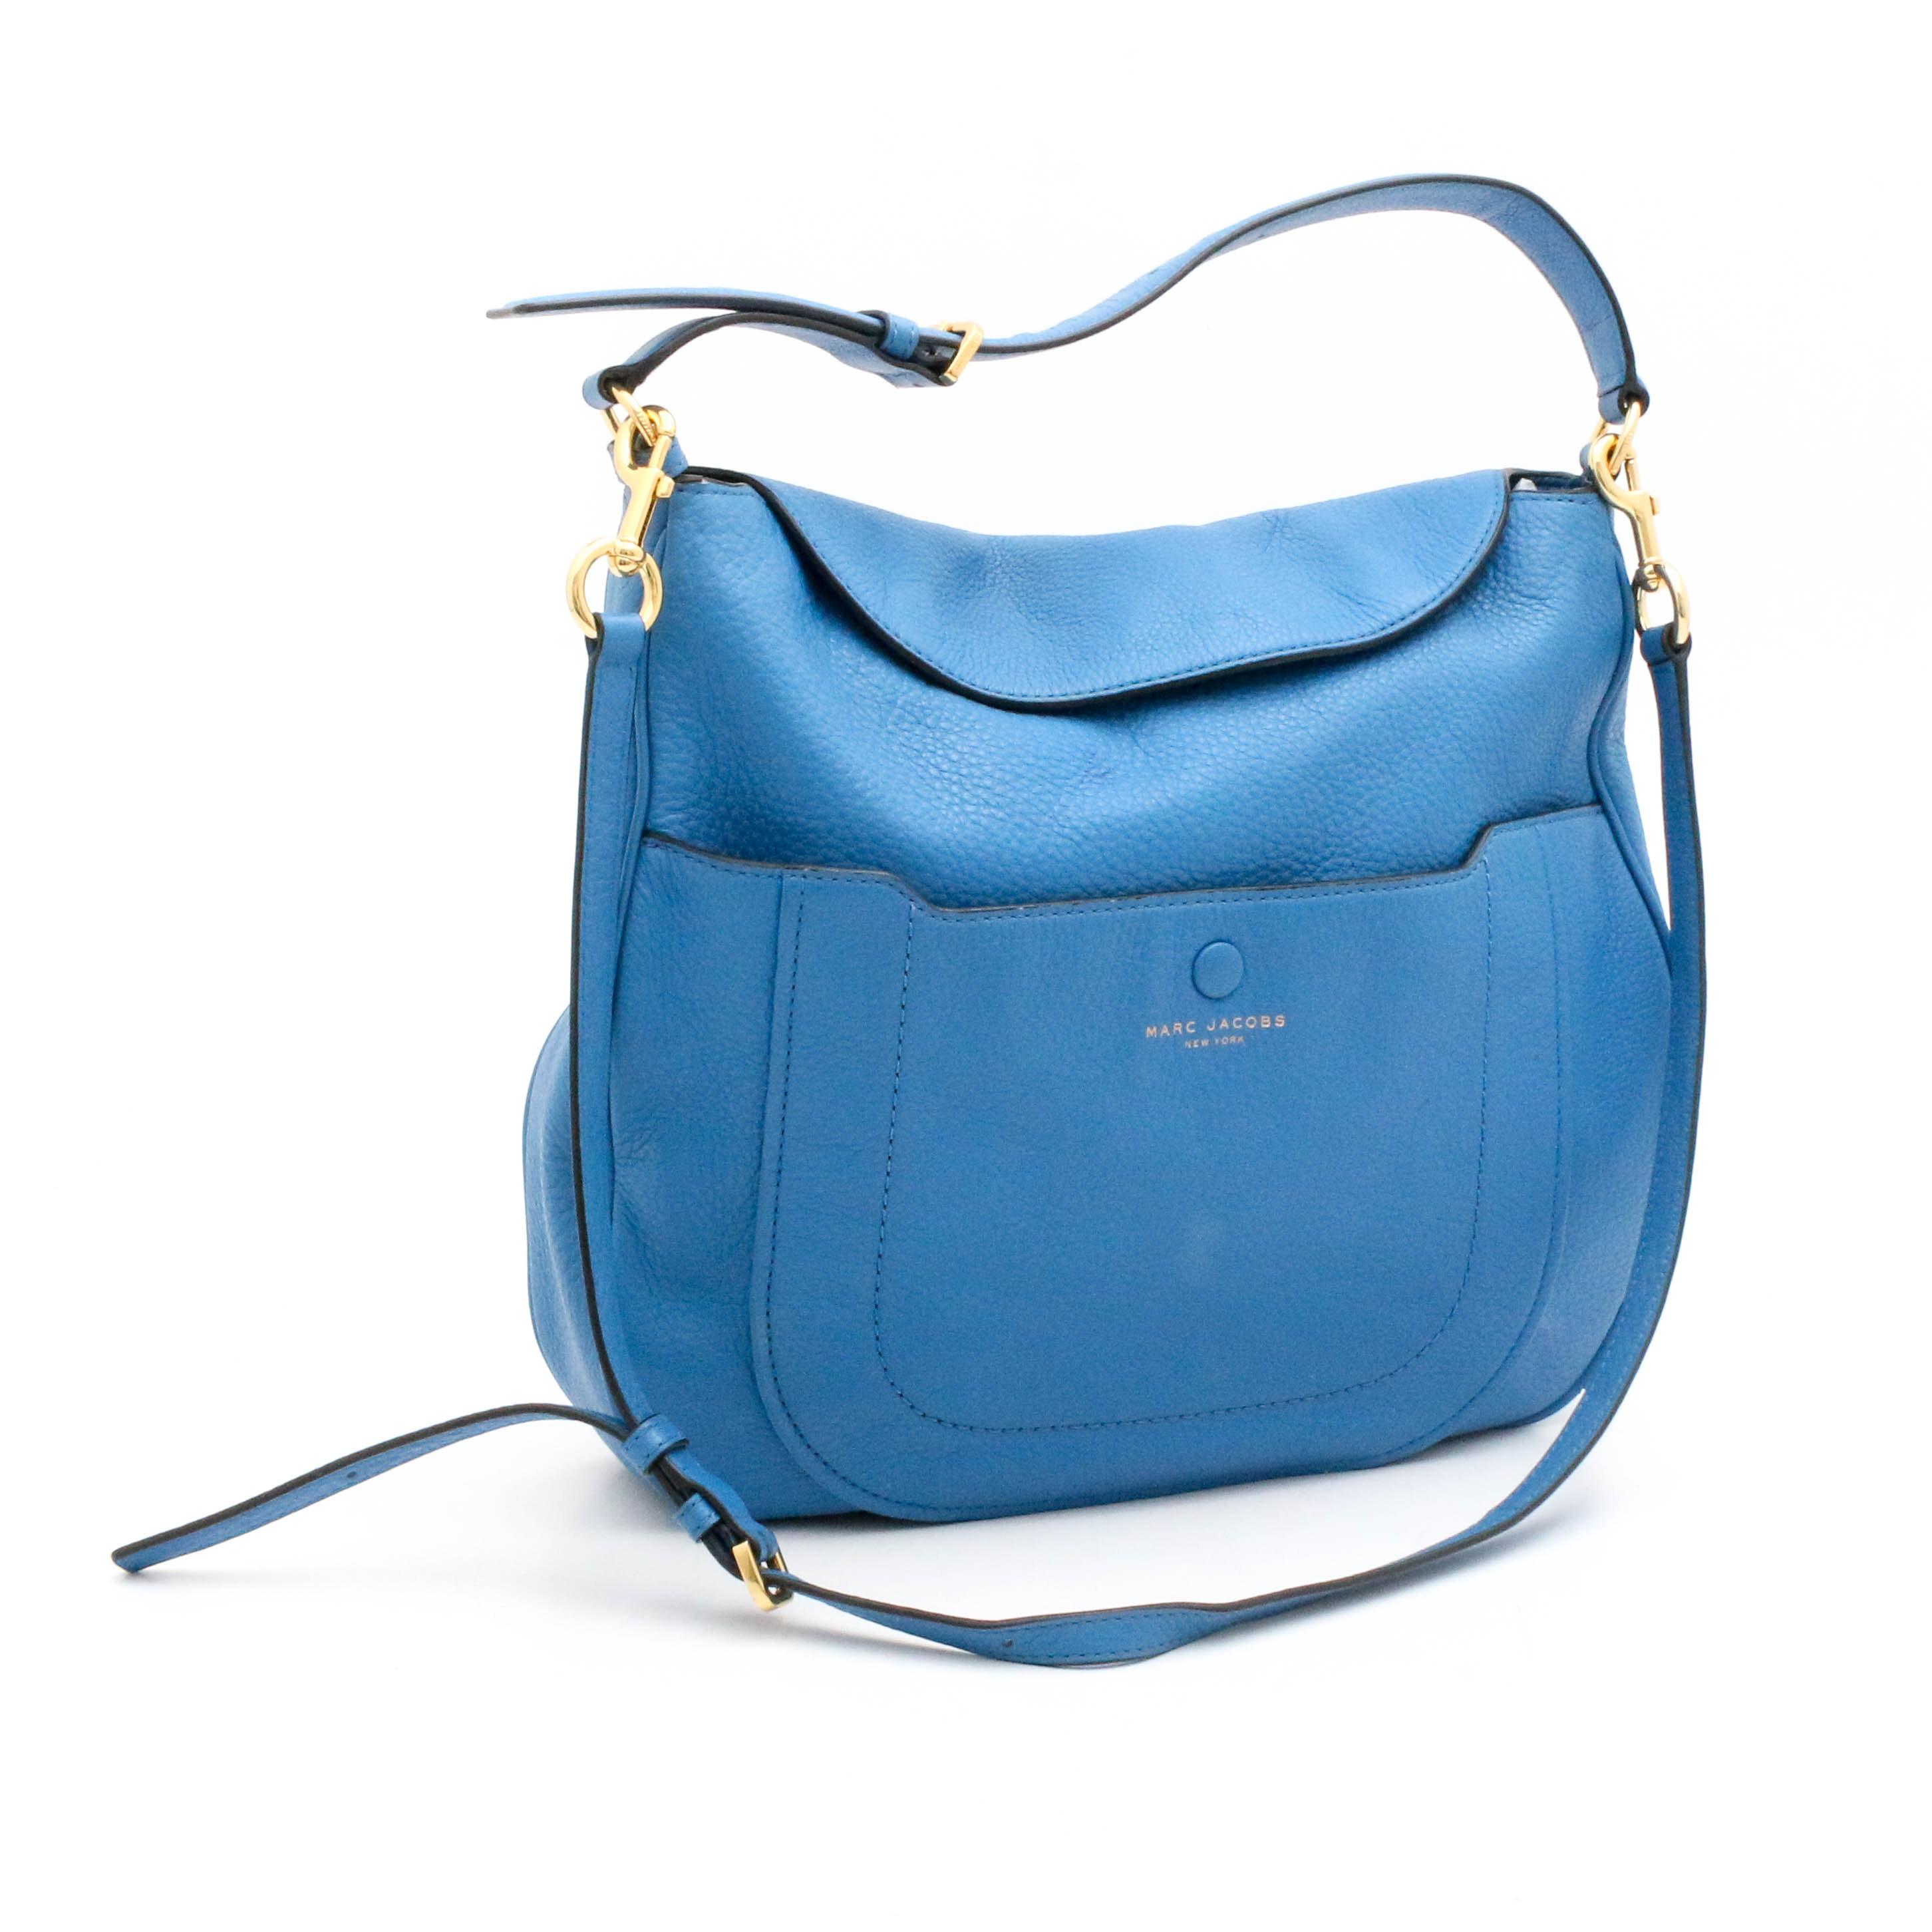 Marc Jacobs New York Empire City Blue Pebbled Leather Hobo Crossbody Bag